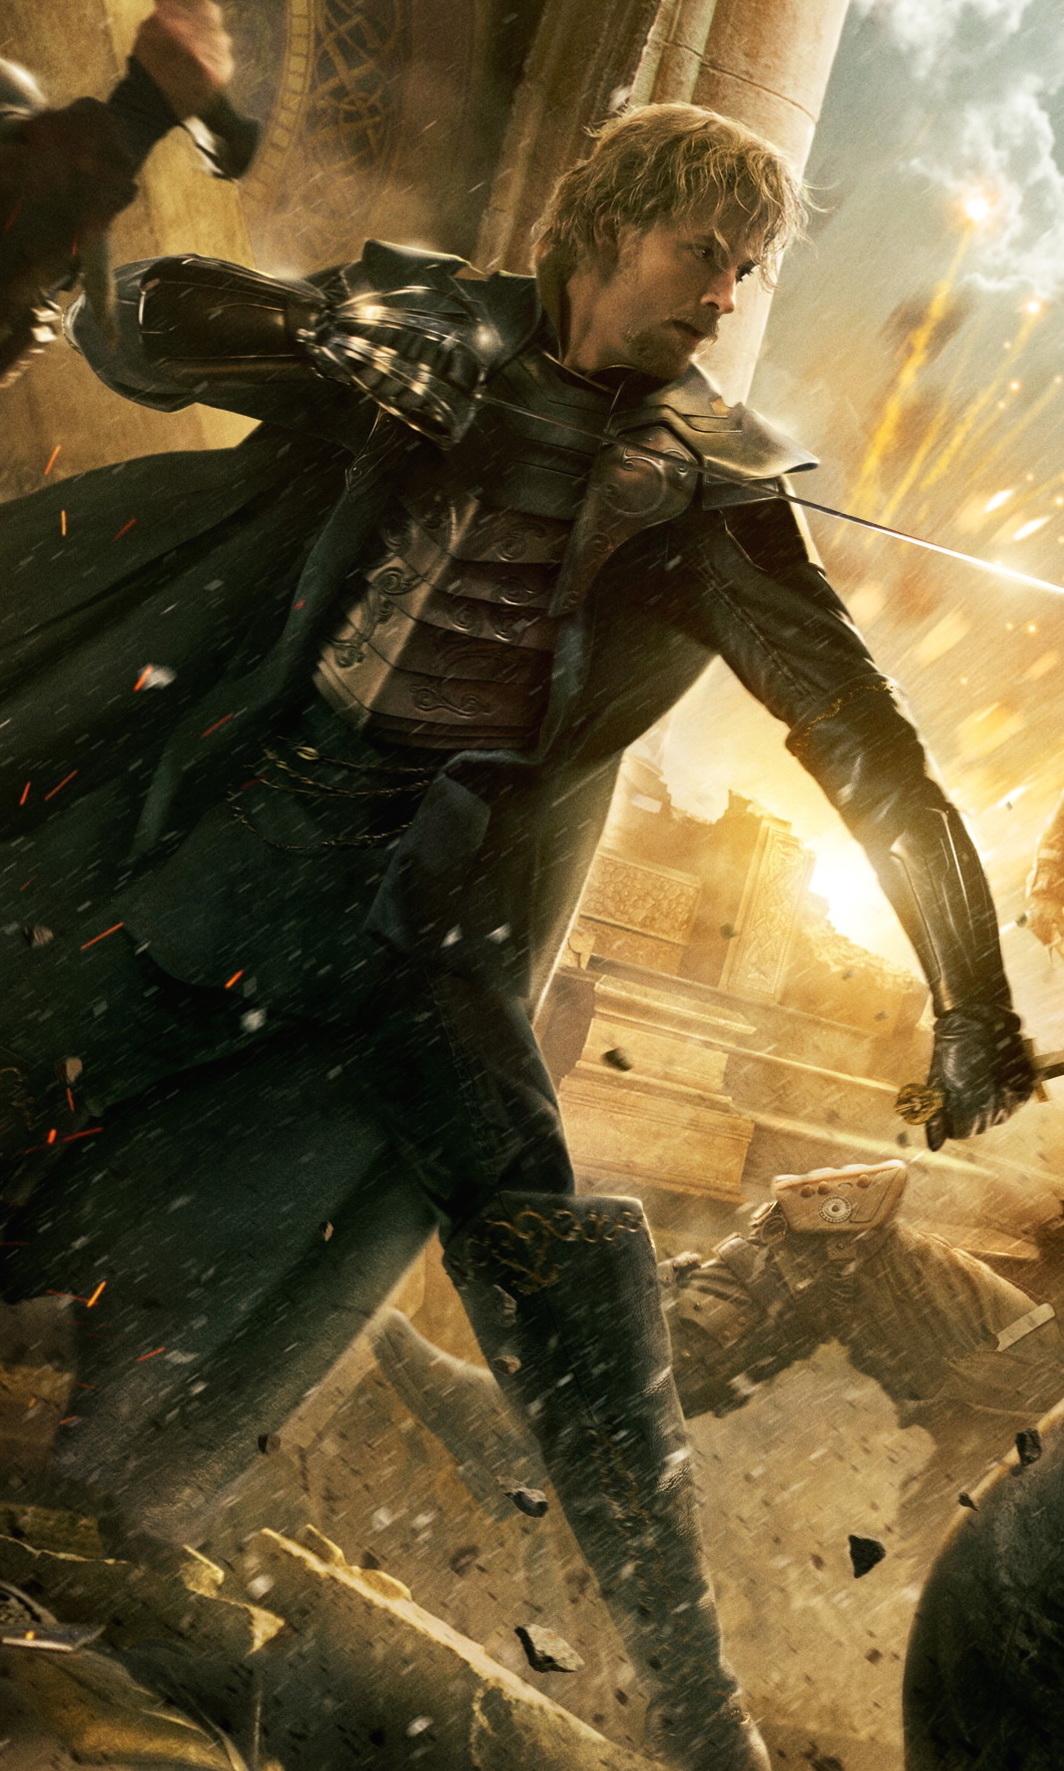 Fandral Marvel Cinematic Universe Wiki Fandom Powered